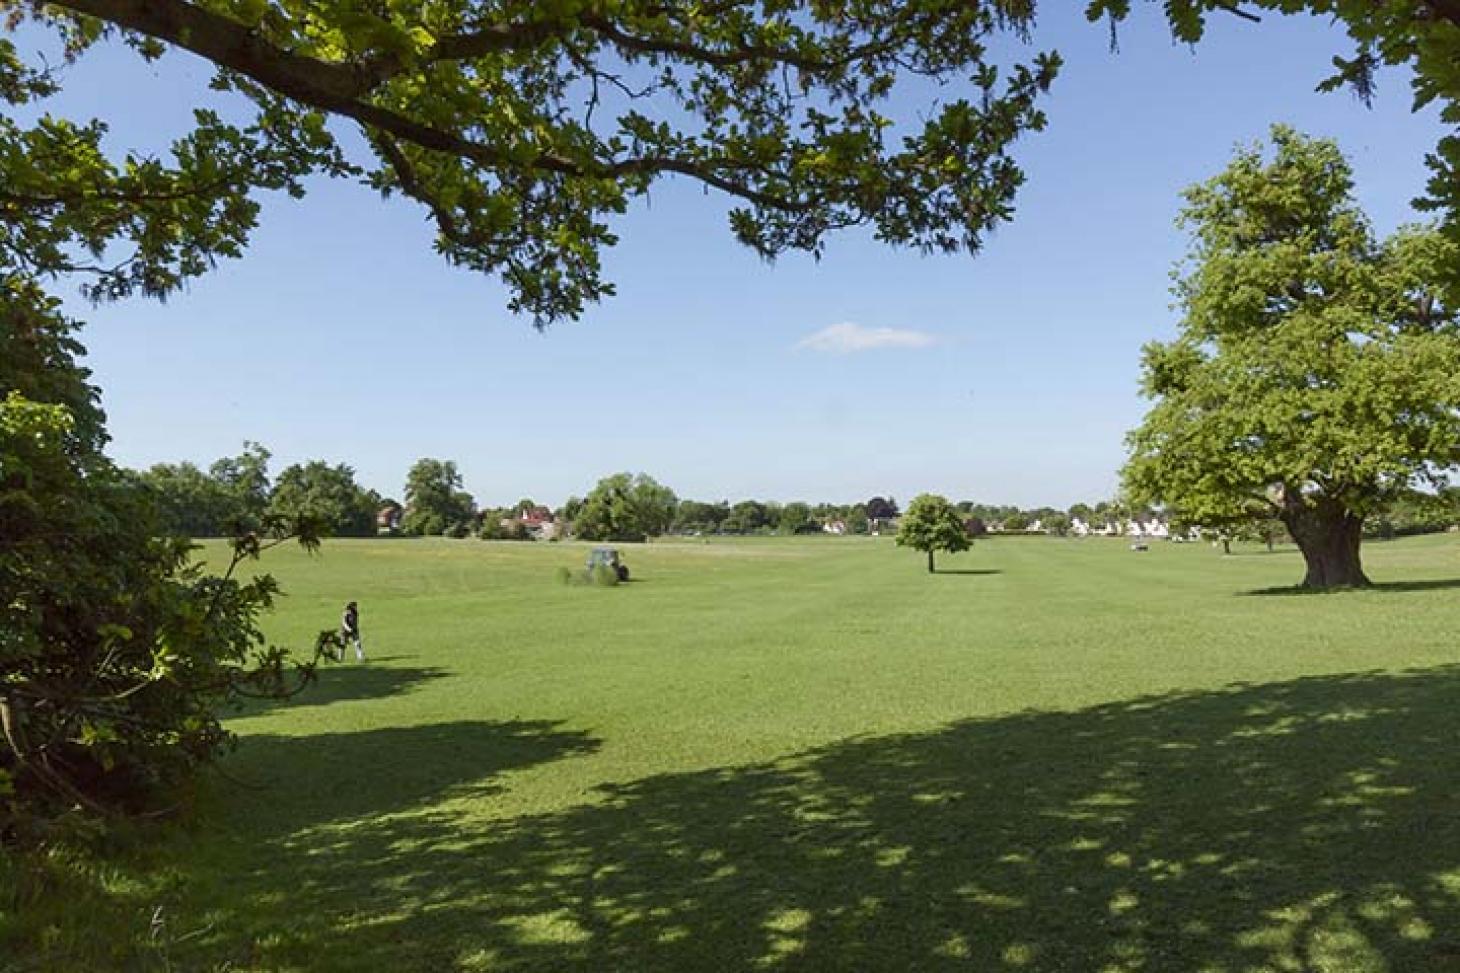 Lloyd Park 11 a side | Grass football pitch